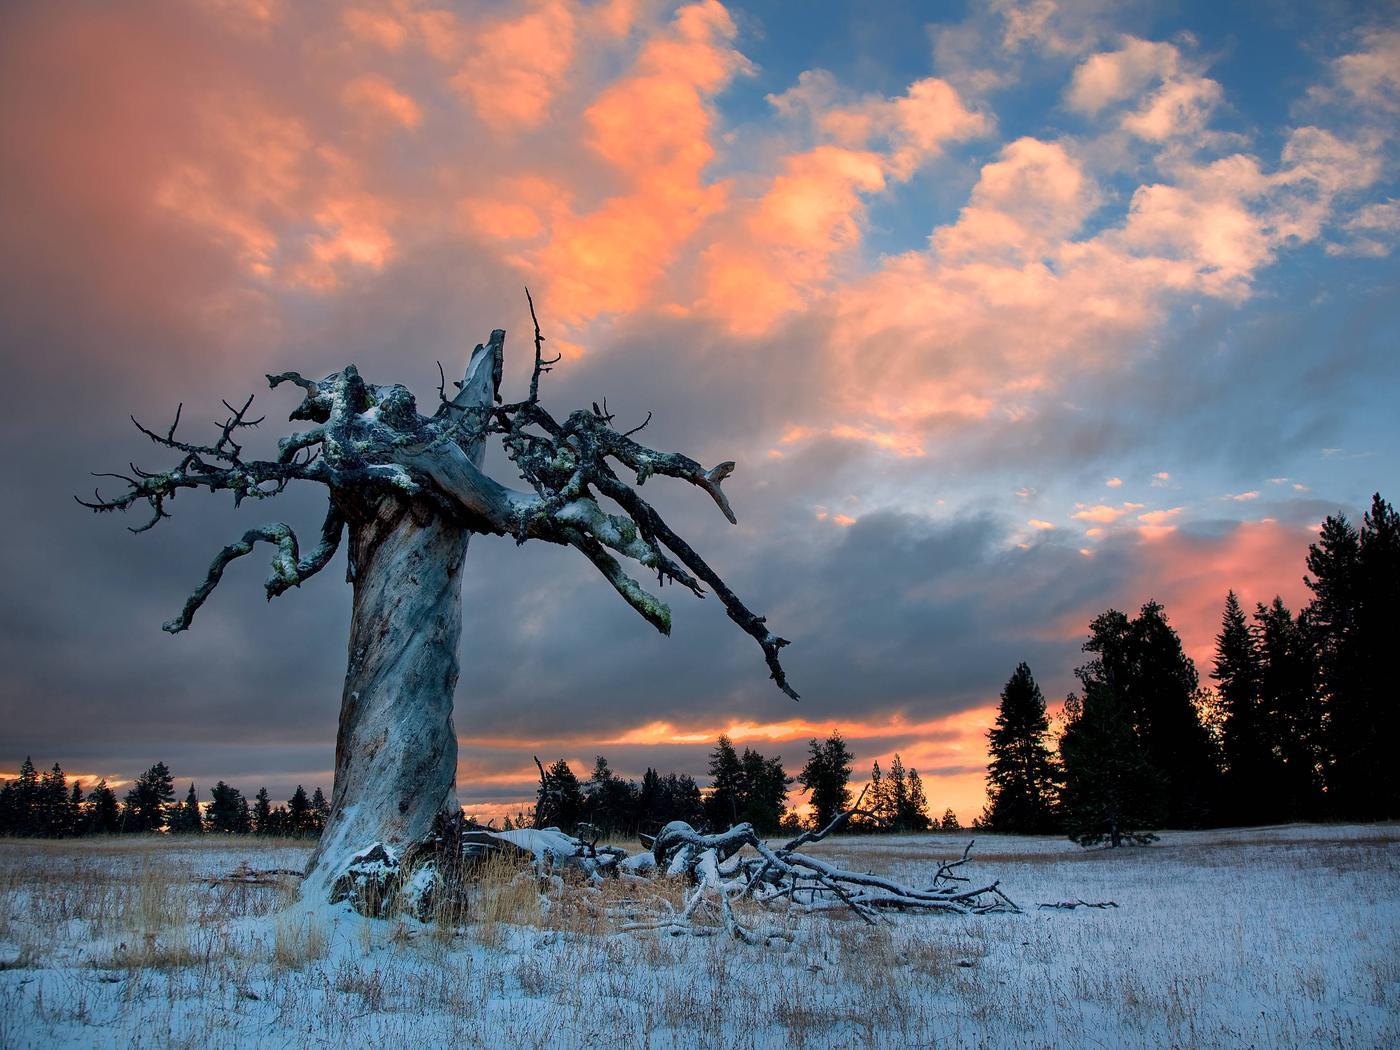 Old Ponderosa Pine broken by lightning or wind at sunsetOld Ponderosa Pine broken by lightning or wind